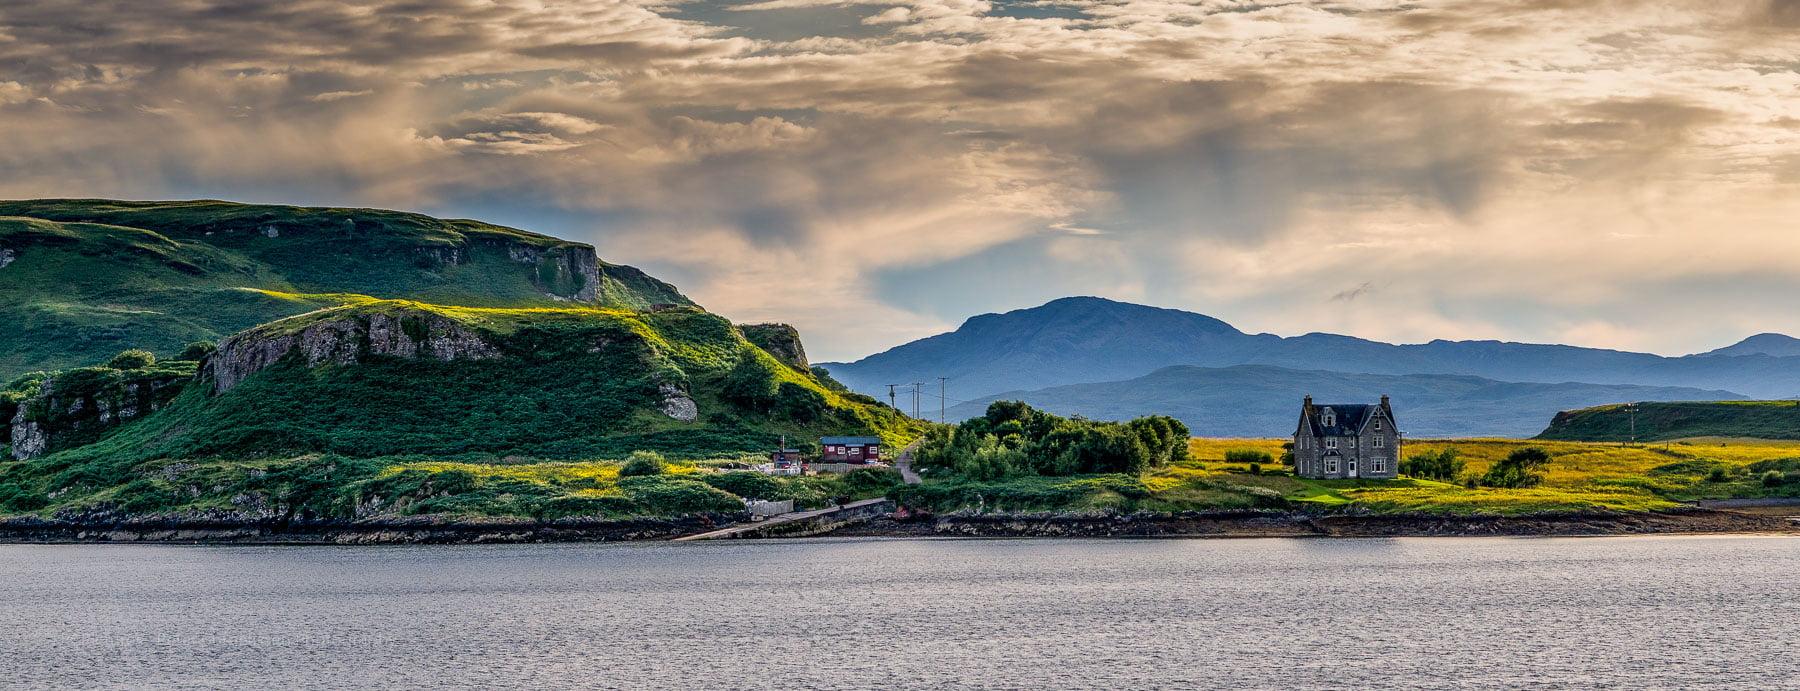 Foto catagoriëen, Panorama, Schotland, seascapes, travel